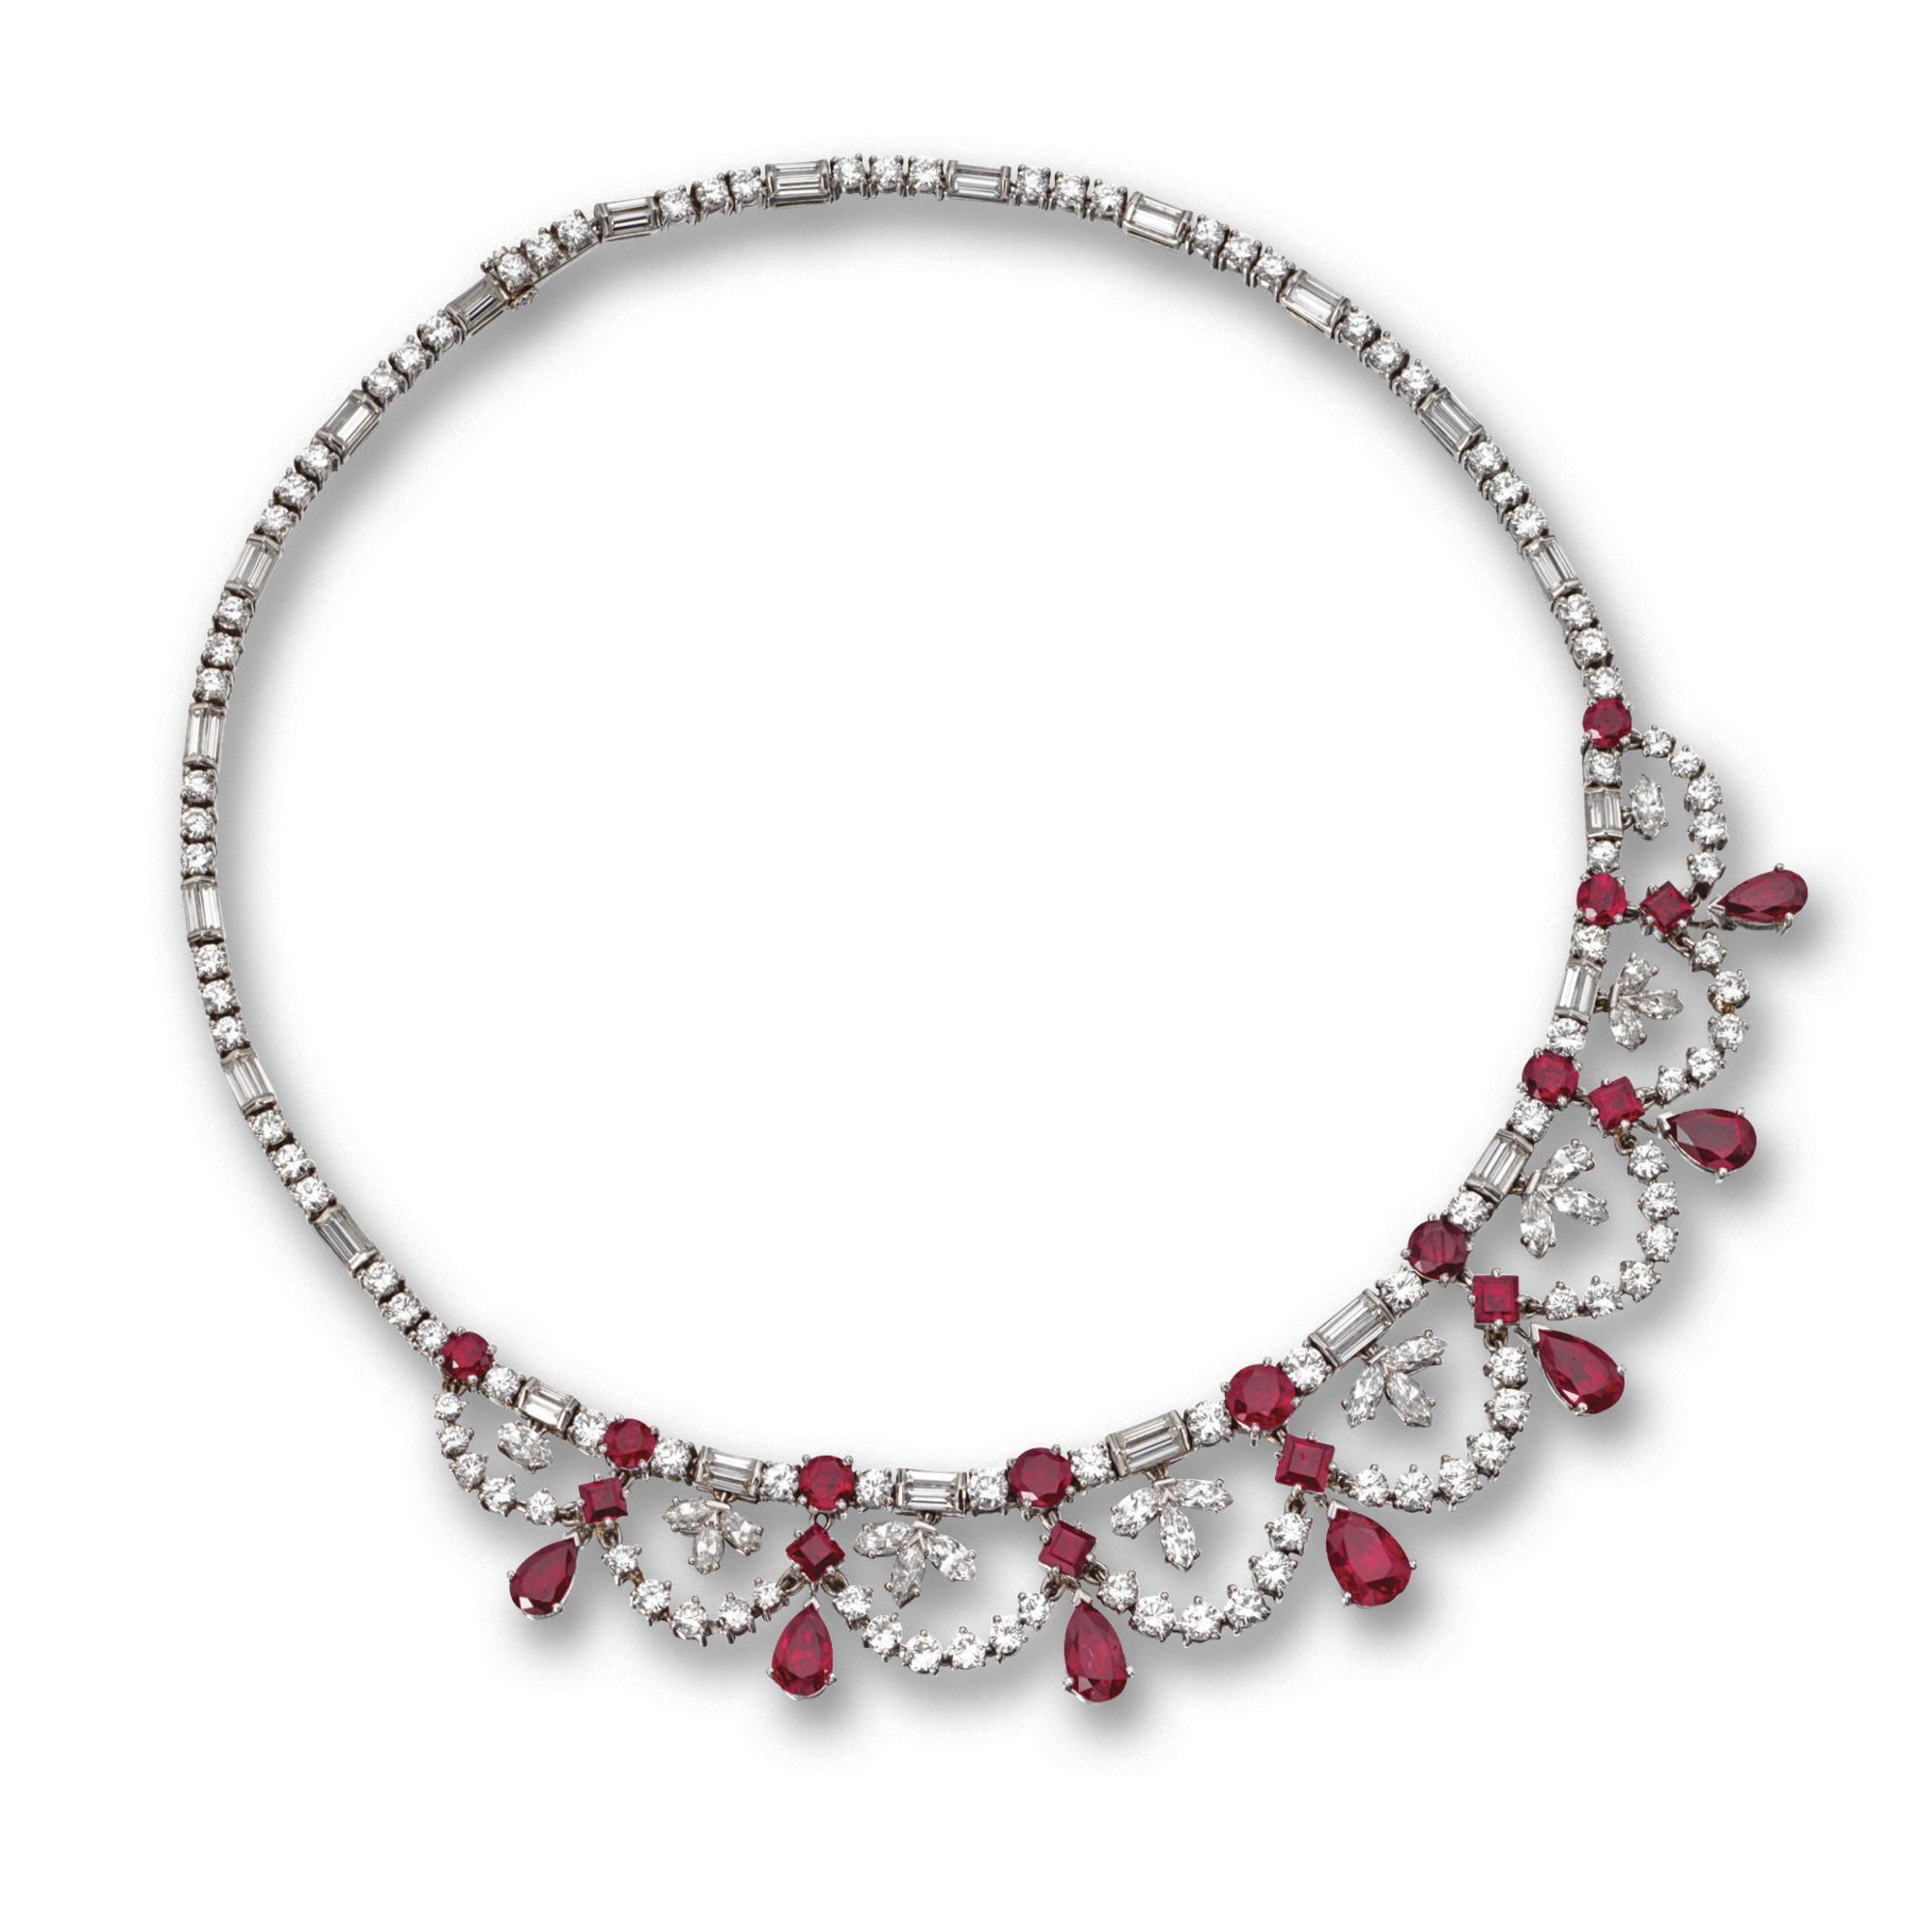 5cd68bcd152cc Ruby and diamond necklace, Tiffany & Co., circa 1950 Estimate 20,000 ...